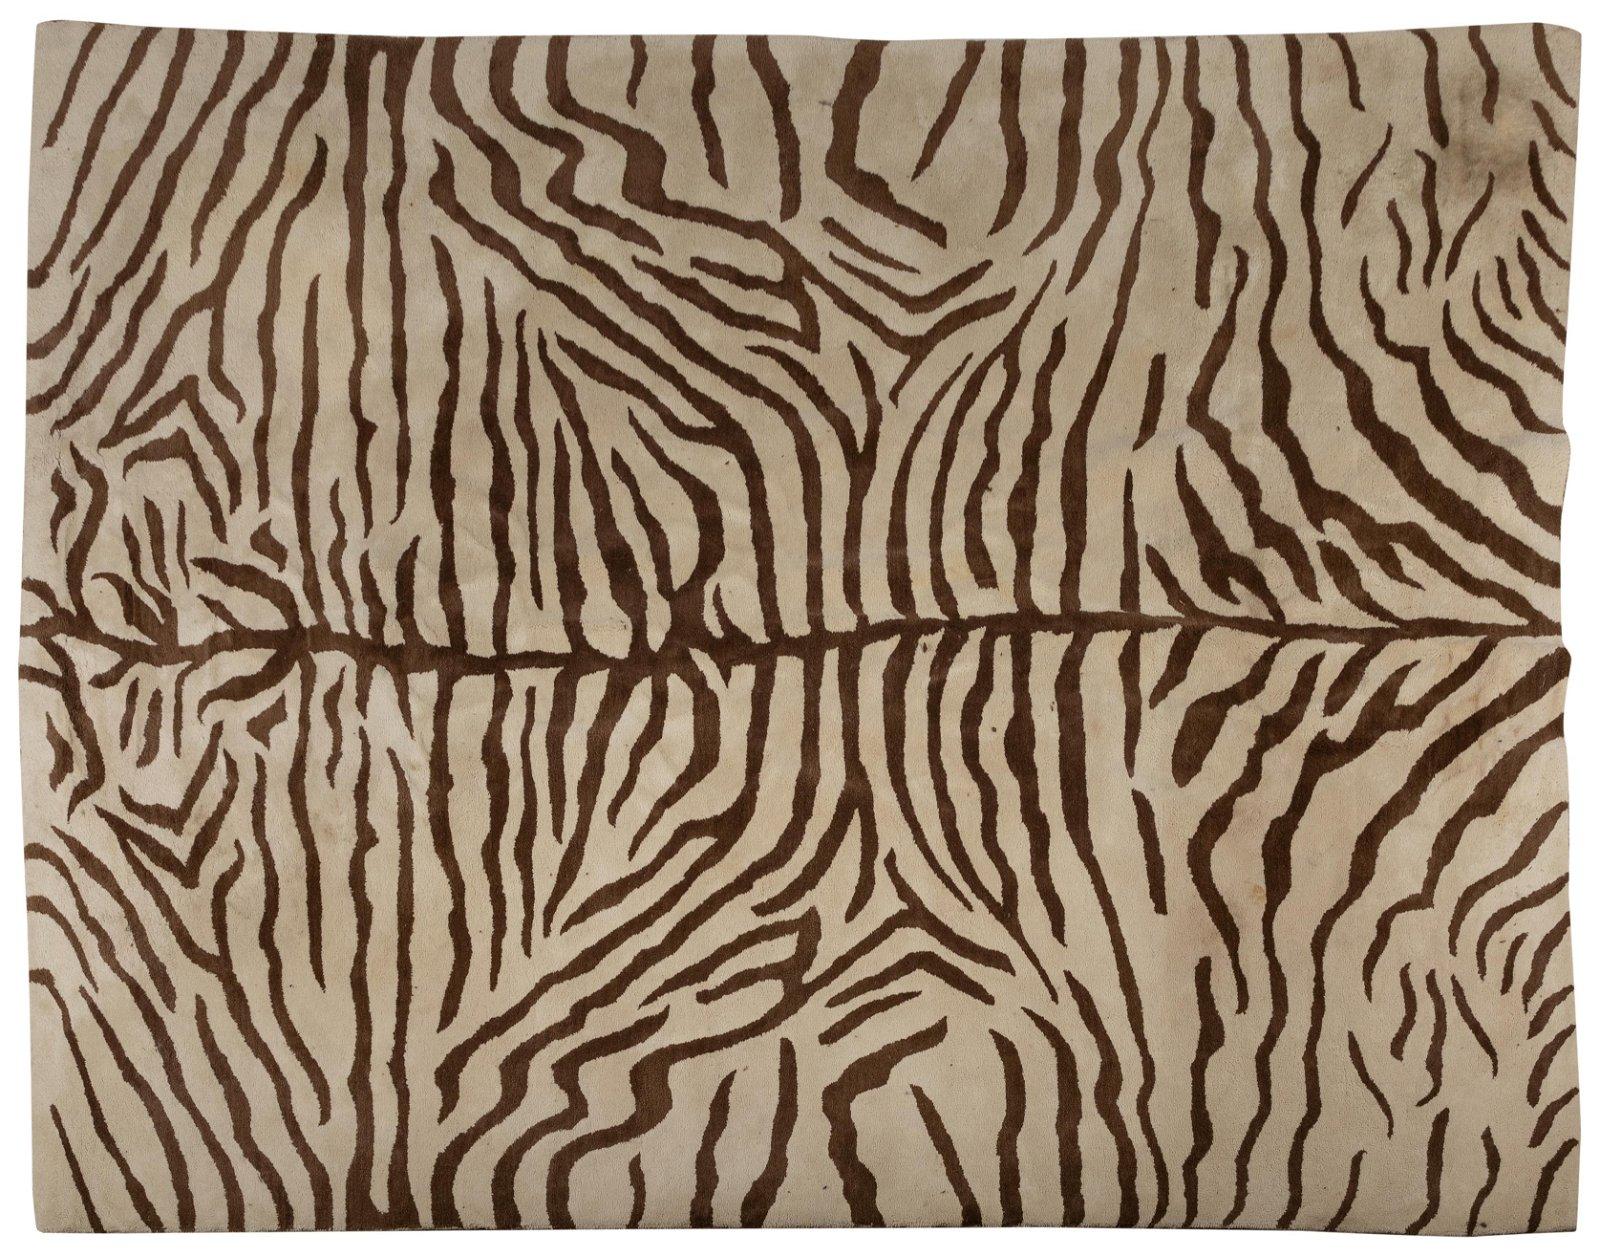 Wool Zebra Pattern Rug